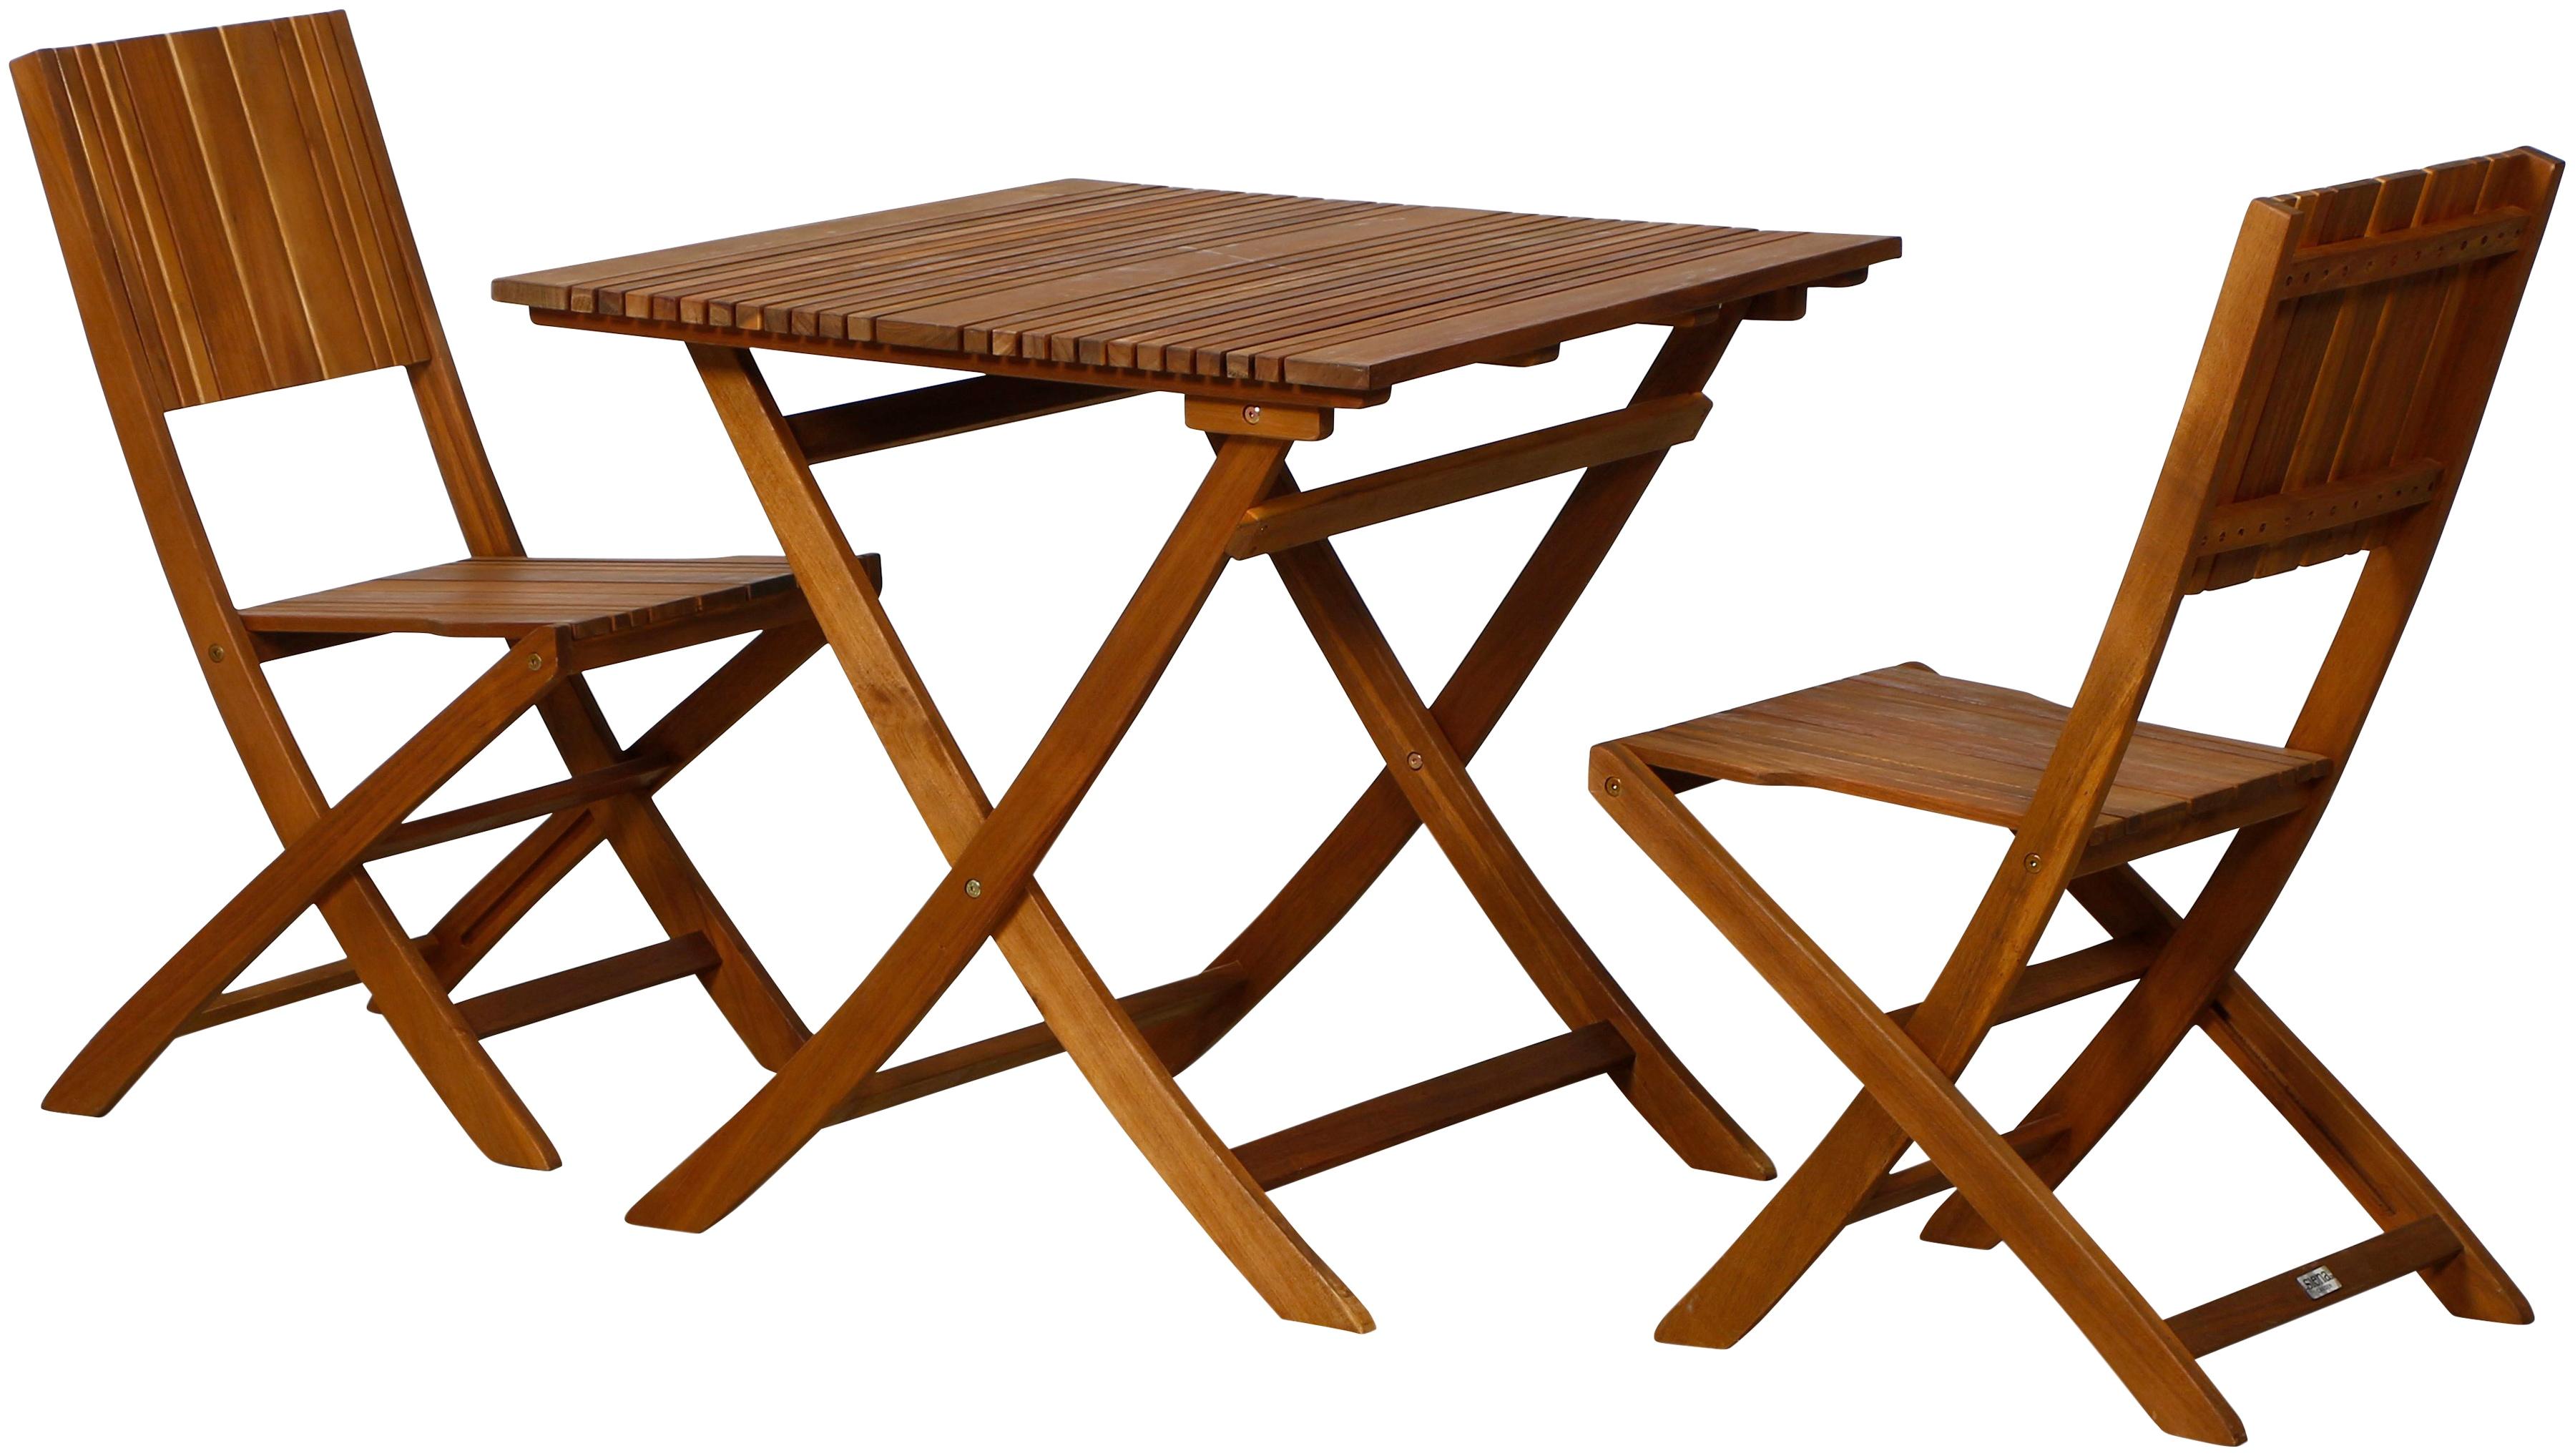 SIENA GARDEN Gartenmöbelset Falun SET 3tlg Akazienholz 2 Stuhl Tisch 80x80 cm